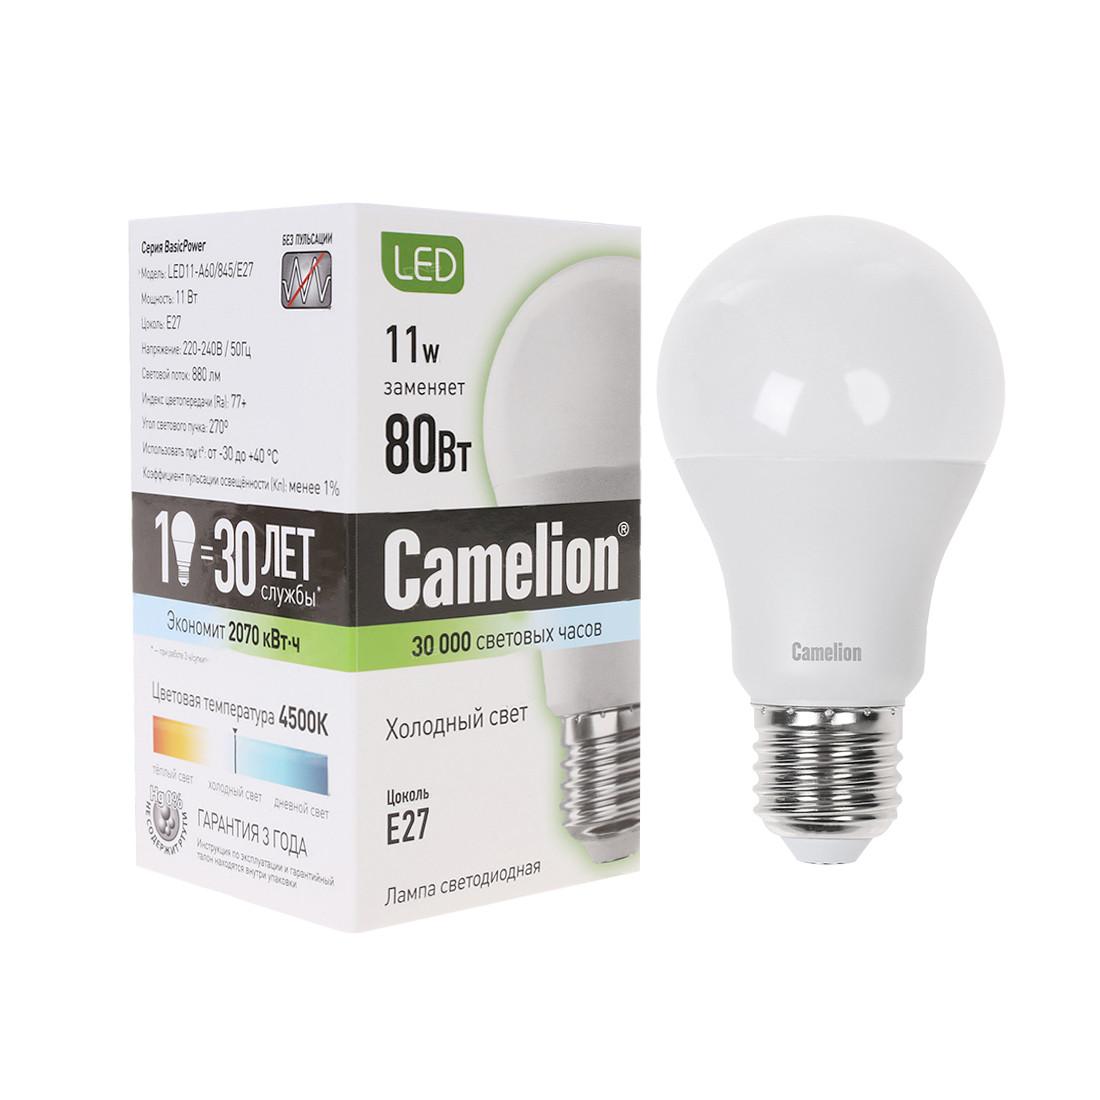 Эл. лампа светодиодная, Camelion, LED11-A60/845/E27